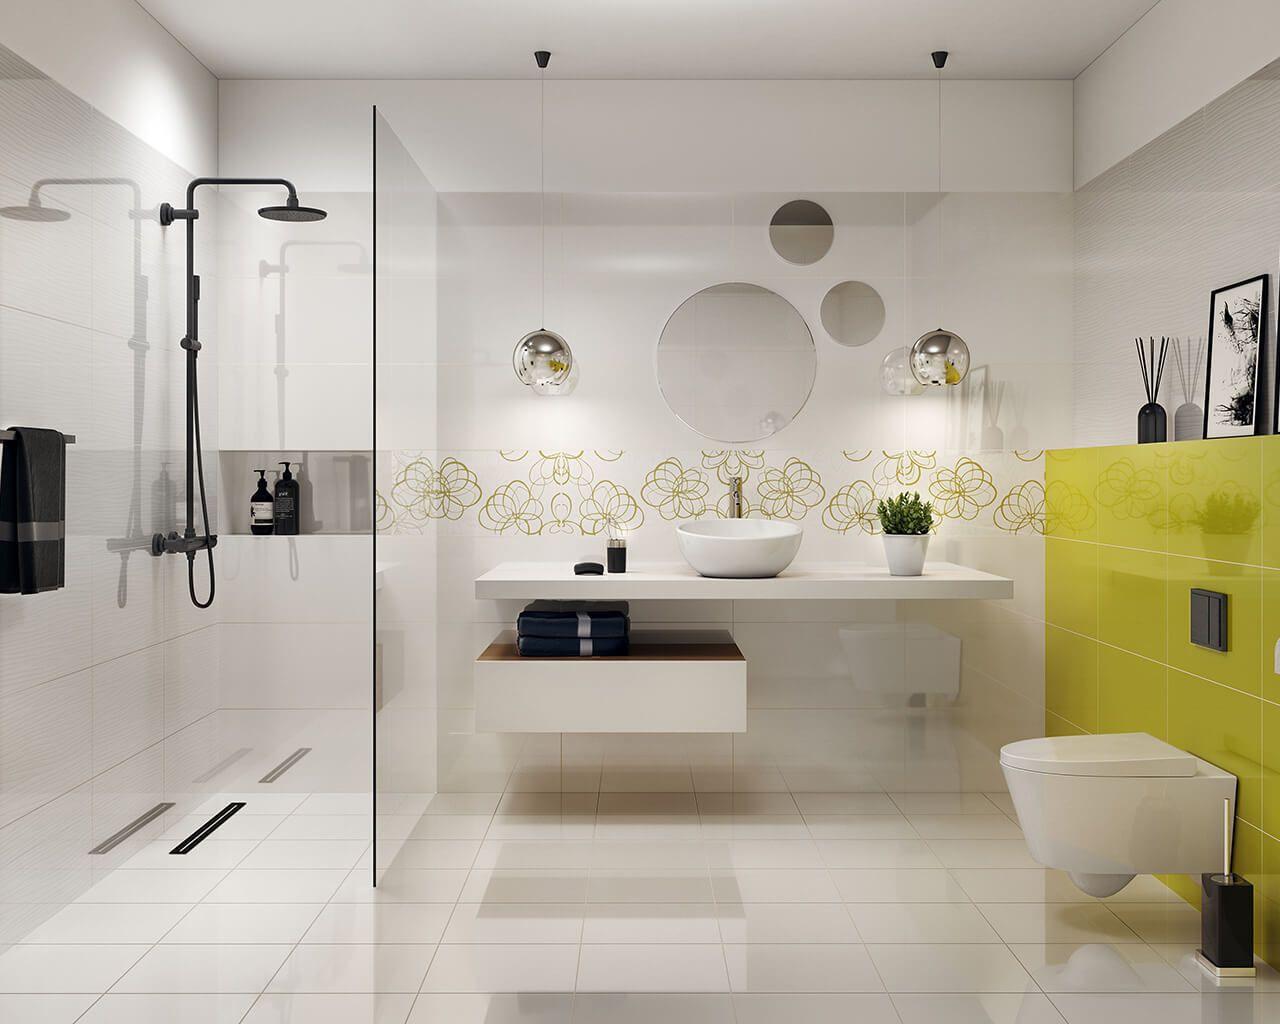 VividaVivido bathroom tiles with a floral motif in lively colours